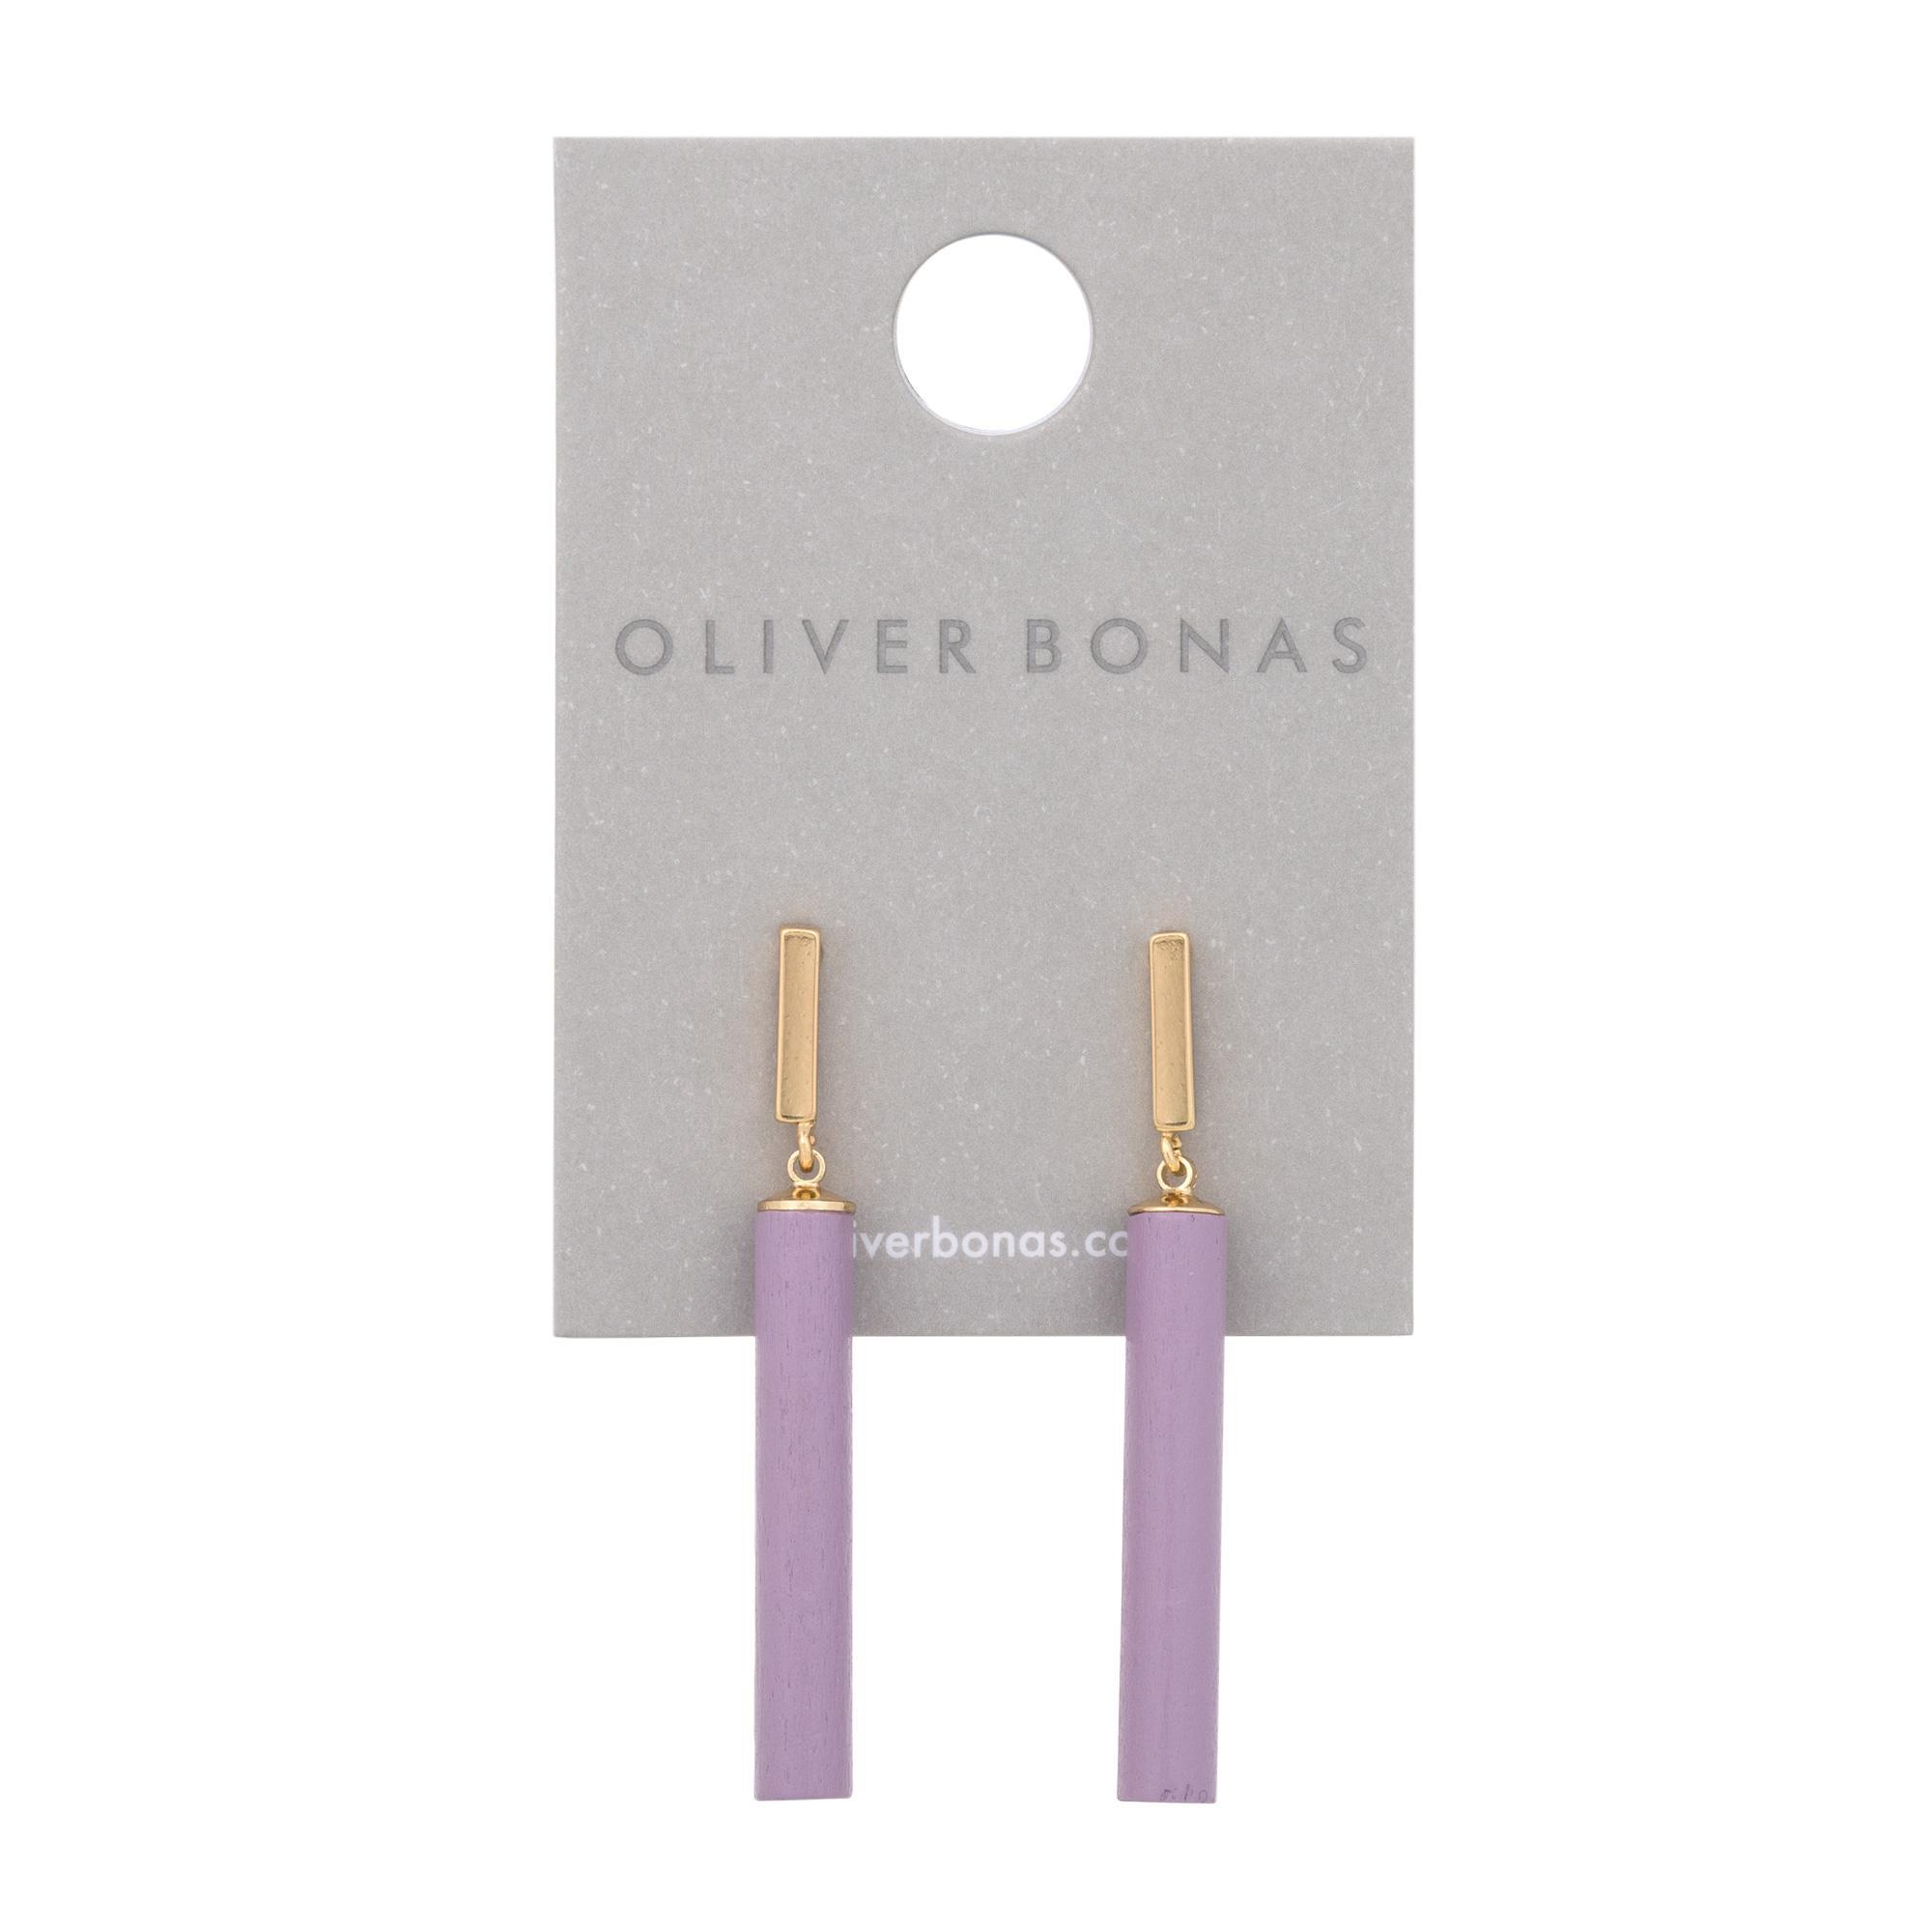 Lyst - Oliver Bonas Lander Wooden Drop Earrings in Metallic